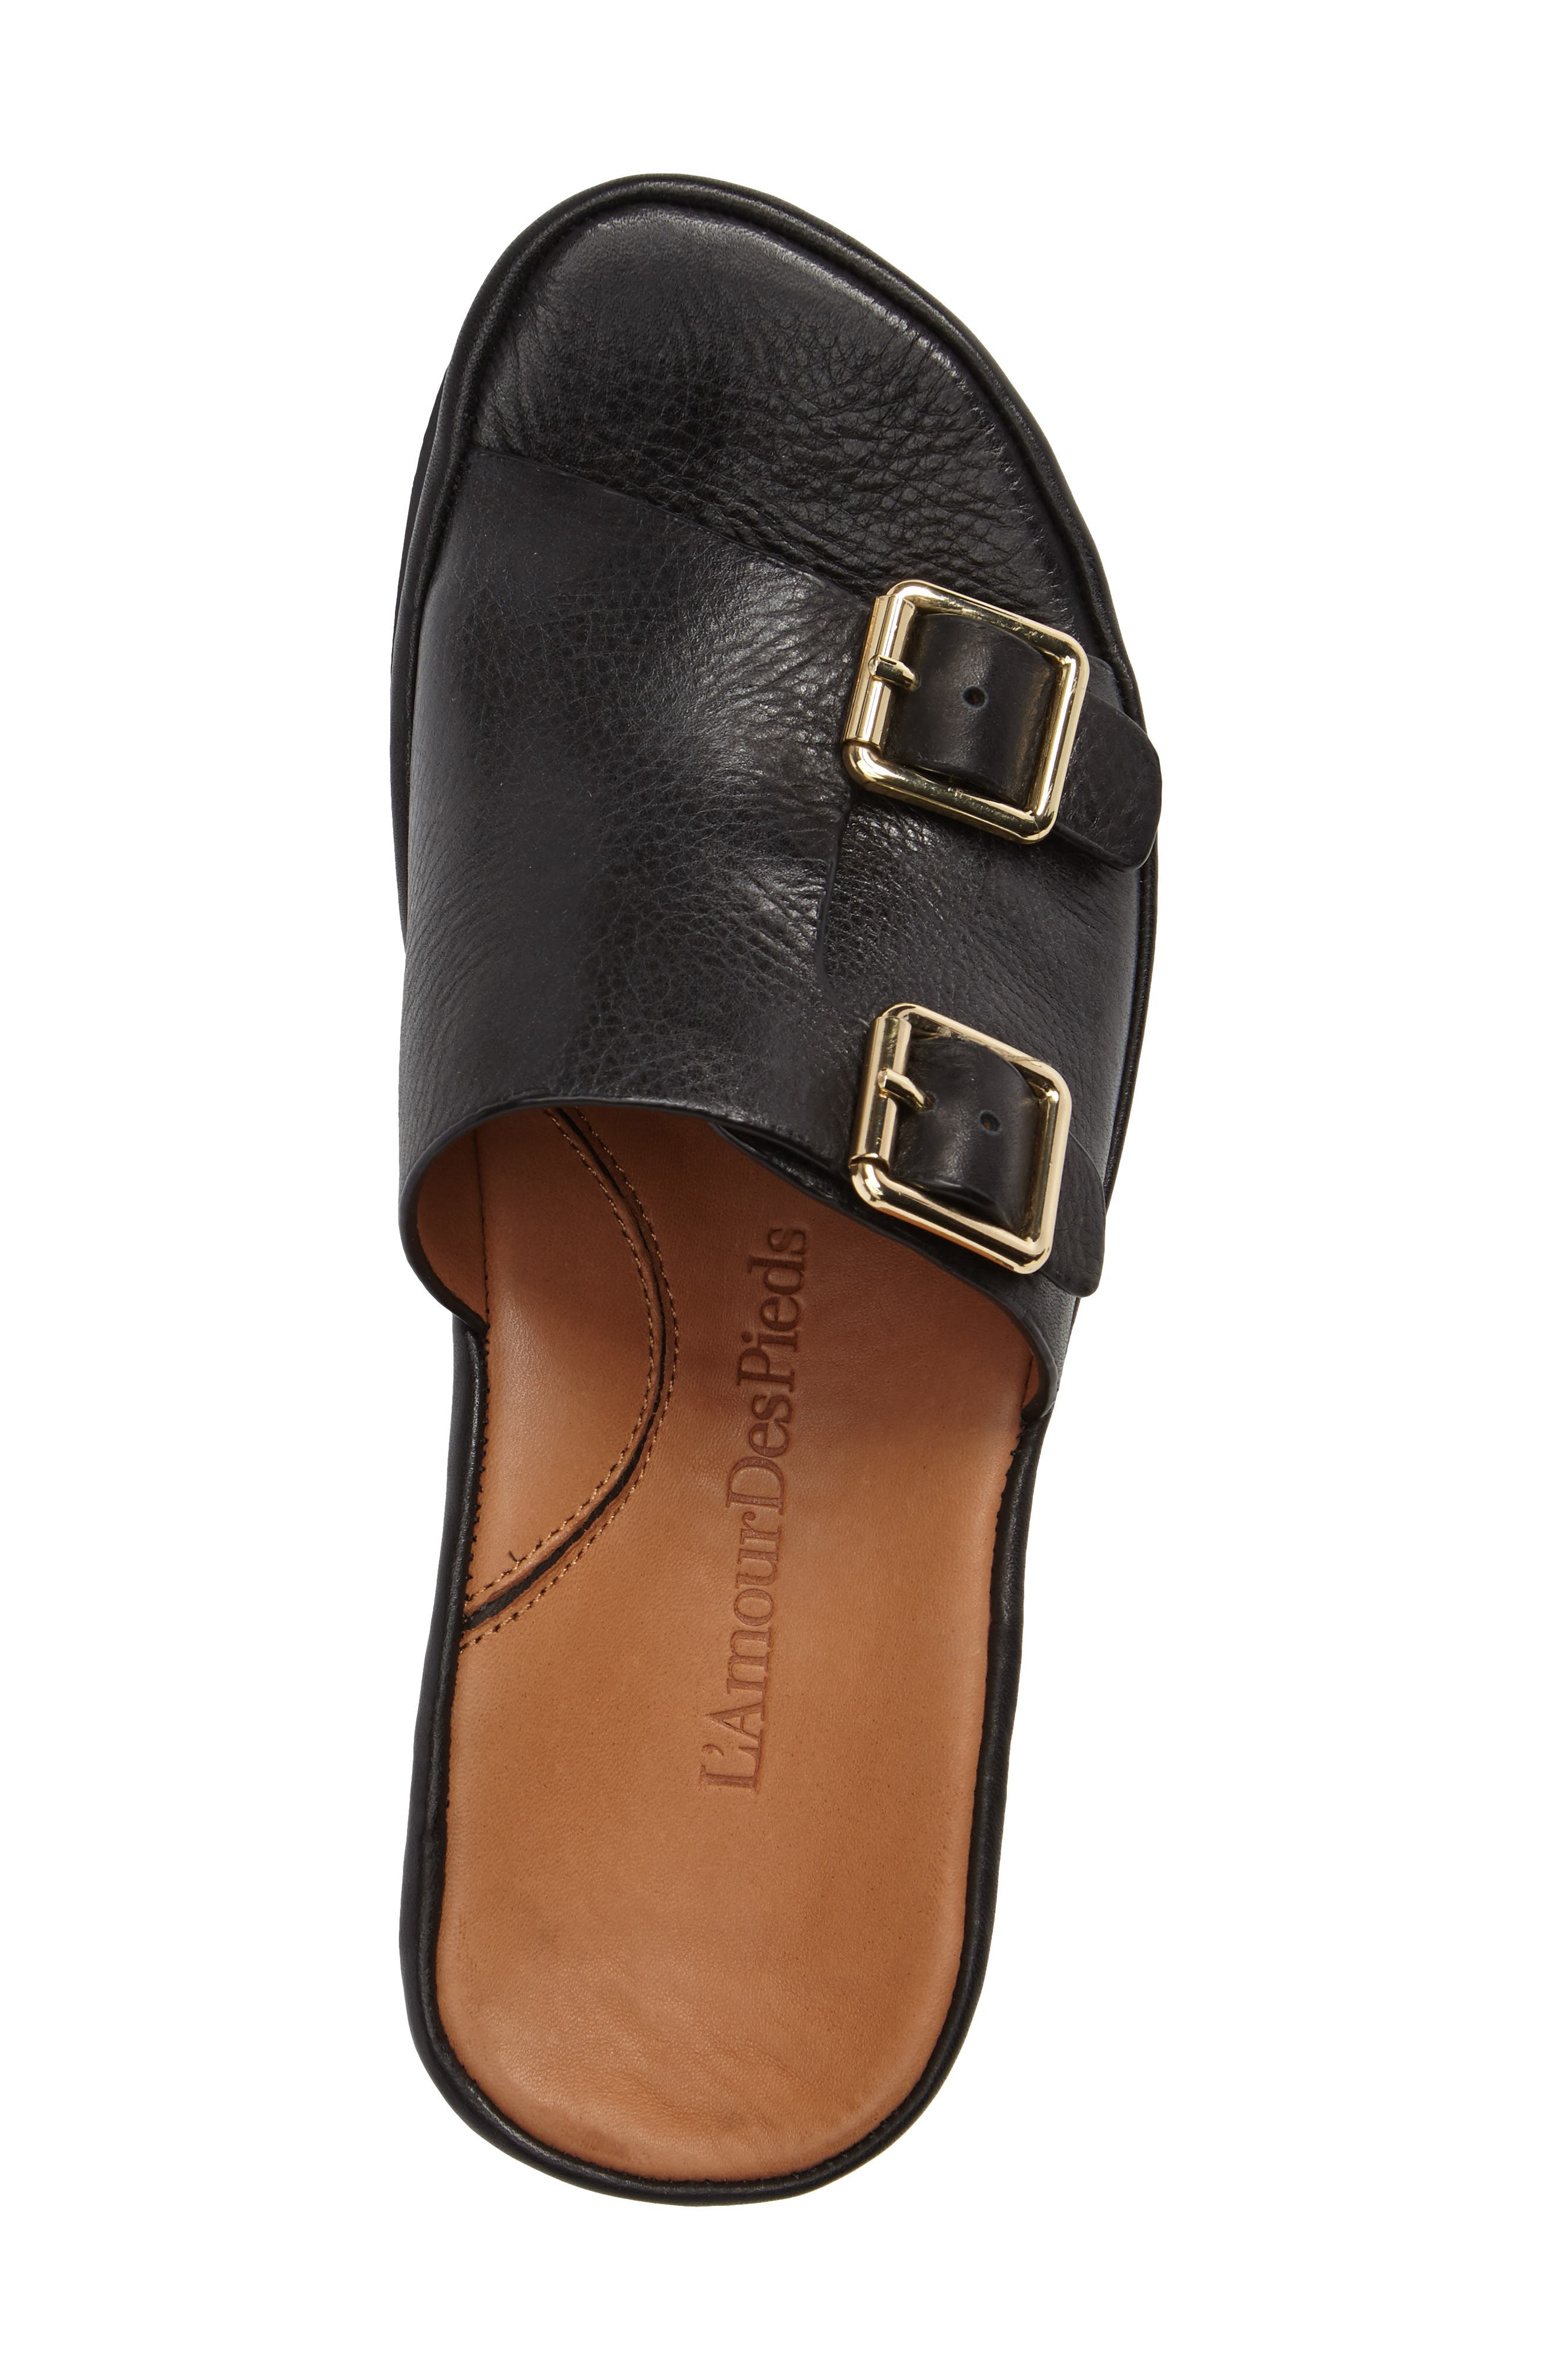 Viareggio Slide Sandal,                             Alternate thumbnail 3, color,                             BLACK LEATHER